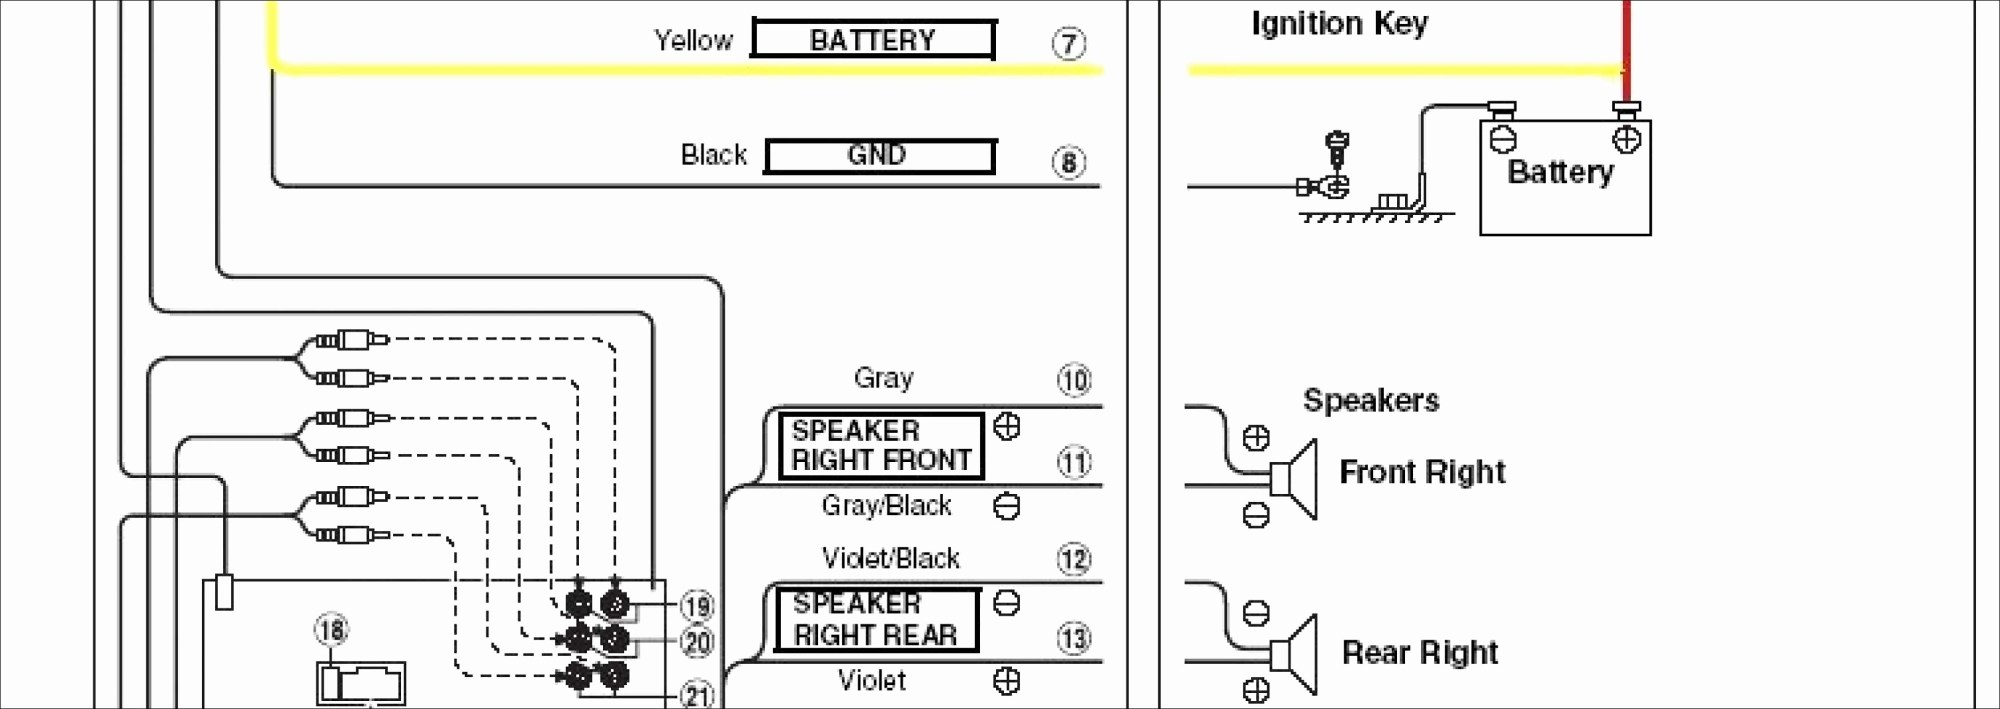 hight resolution of pioneer avh x1500 wiring diagram wiring diagram pioneer avhpioneer avh x1500 wiring diagram wiring diagram